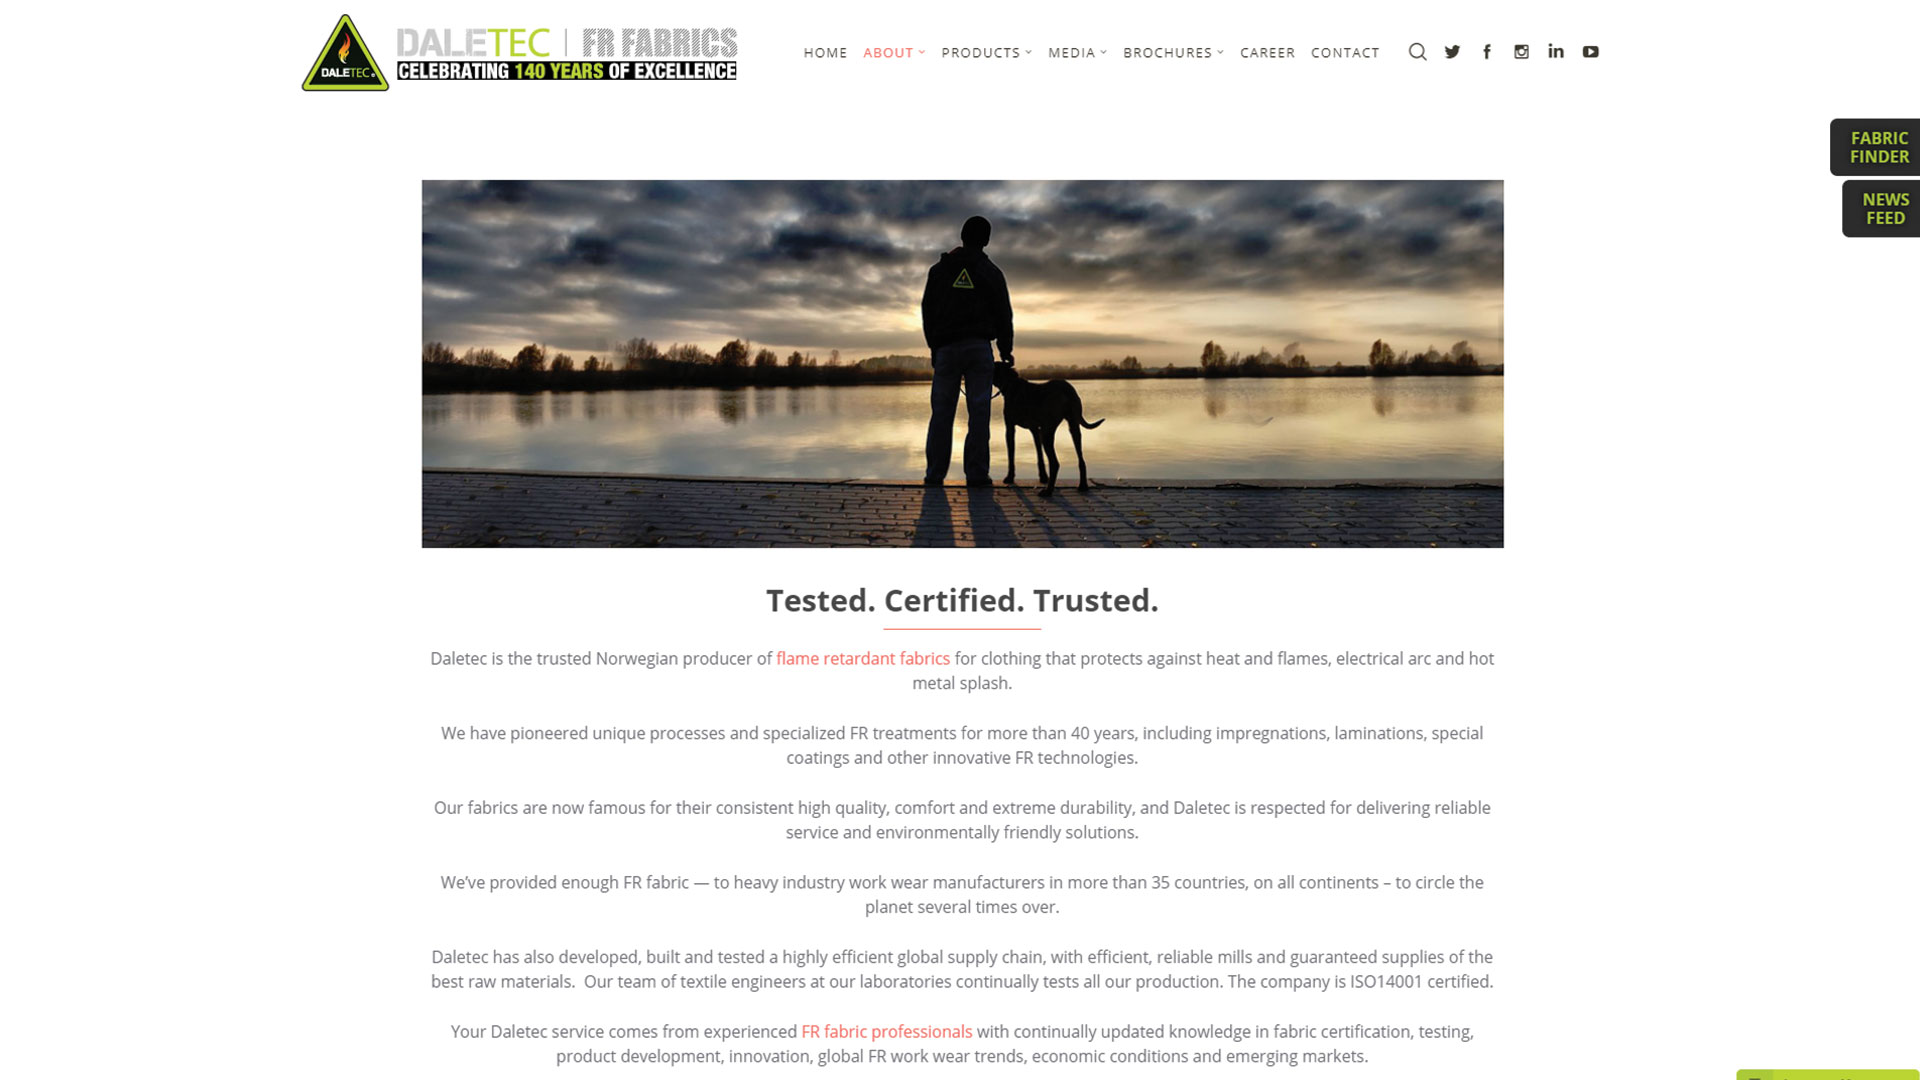 daletec-Vancouver-web-design-Vancouver-web-development-by-mapleweb-canada-about-page